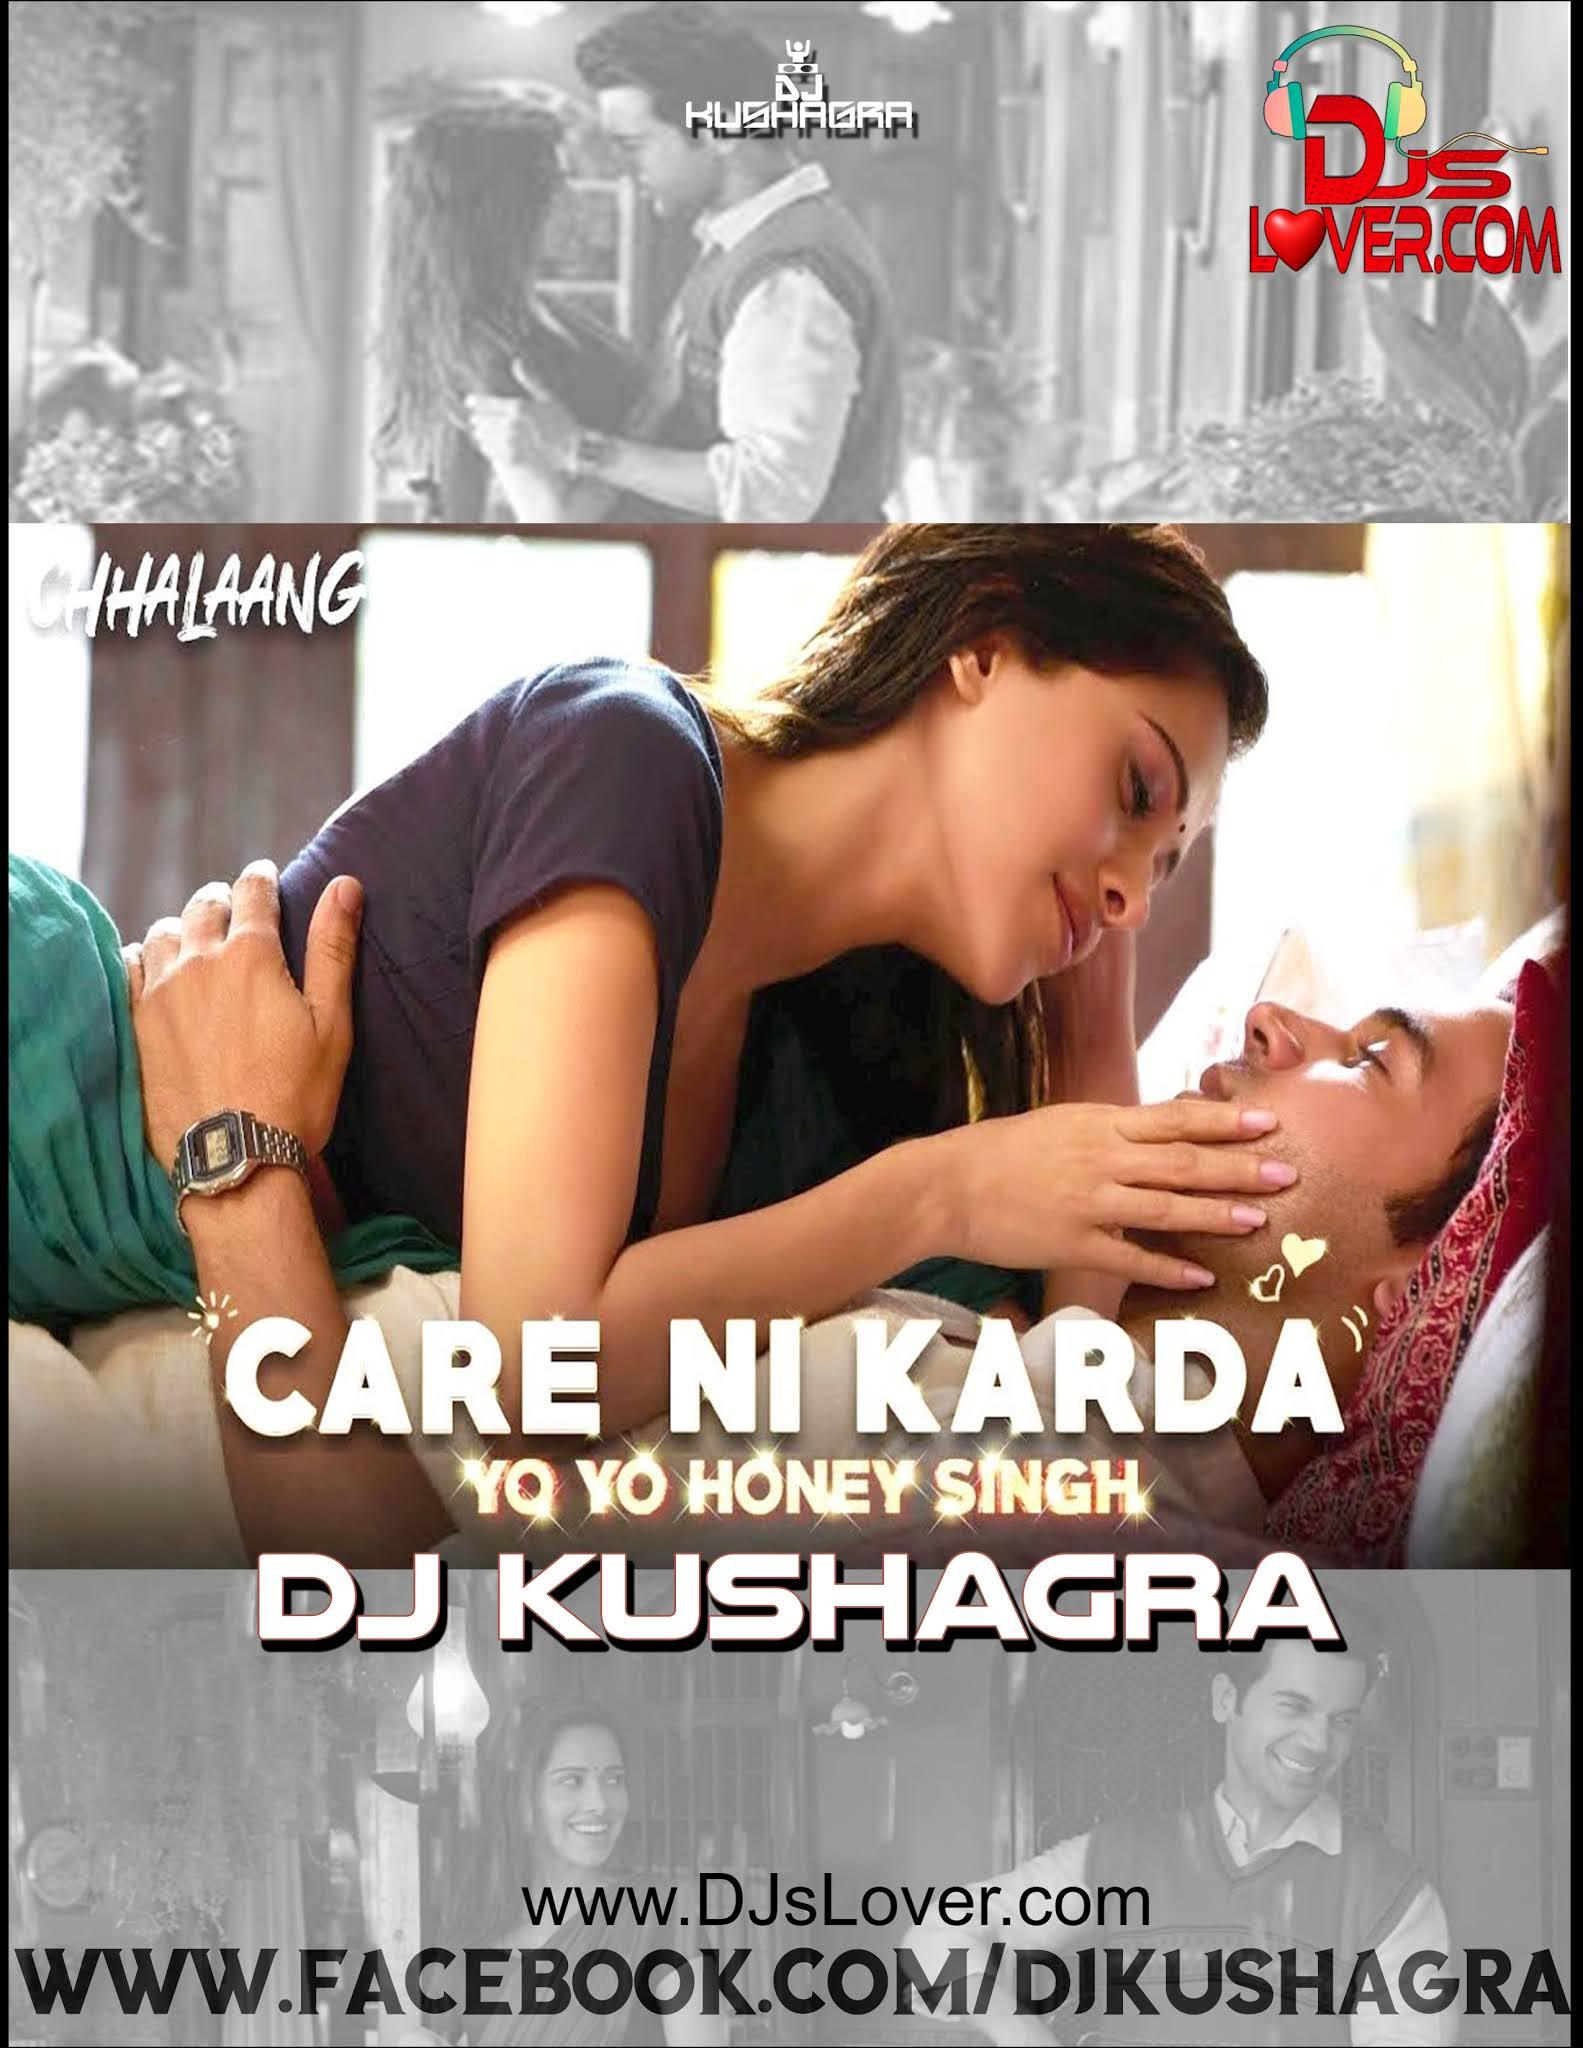 Care Ni Karda Remix DJ Kushagra Ft YYHS | Bollywood Song